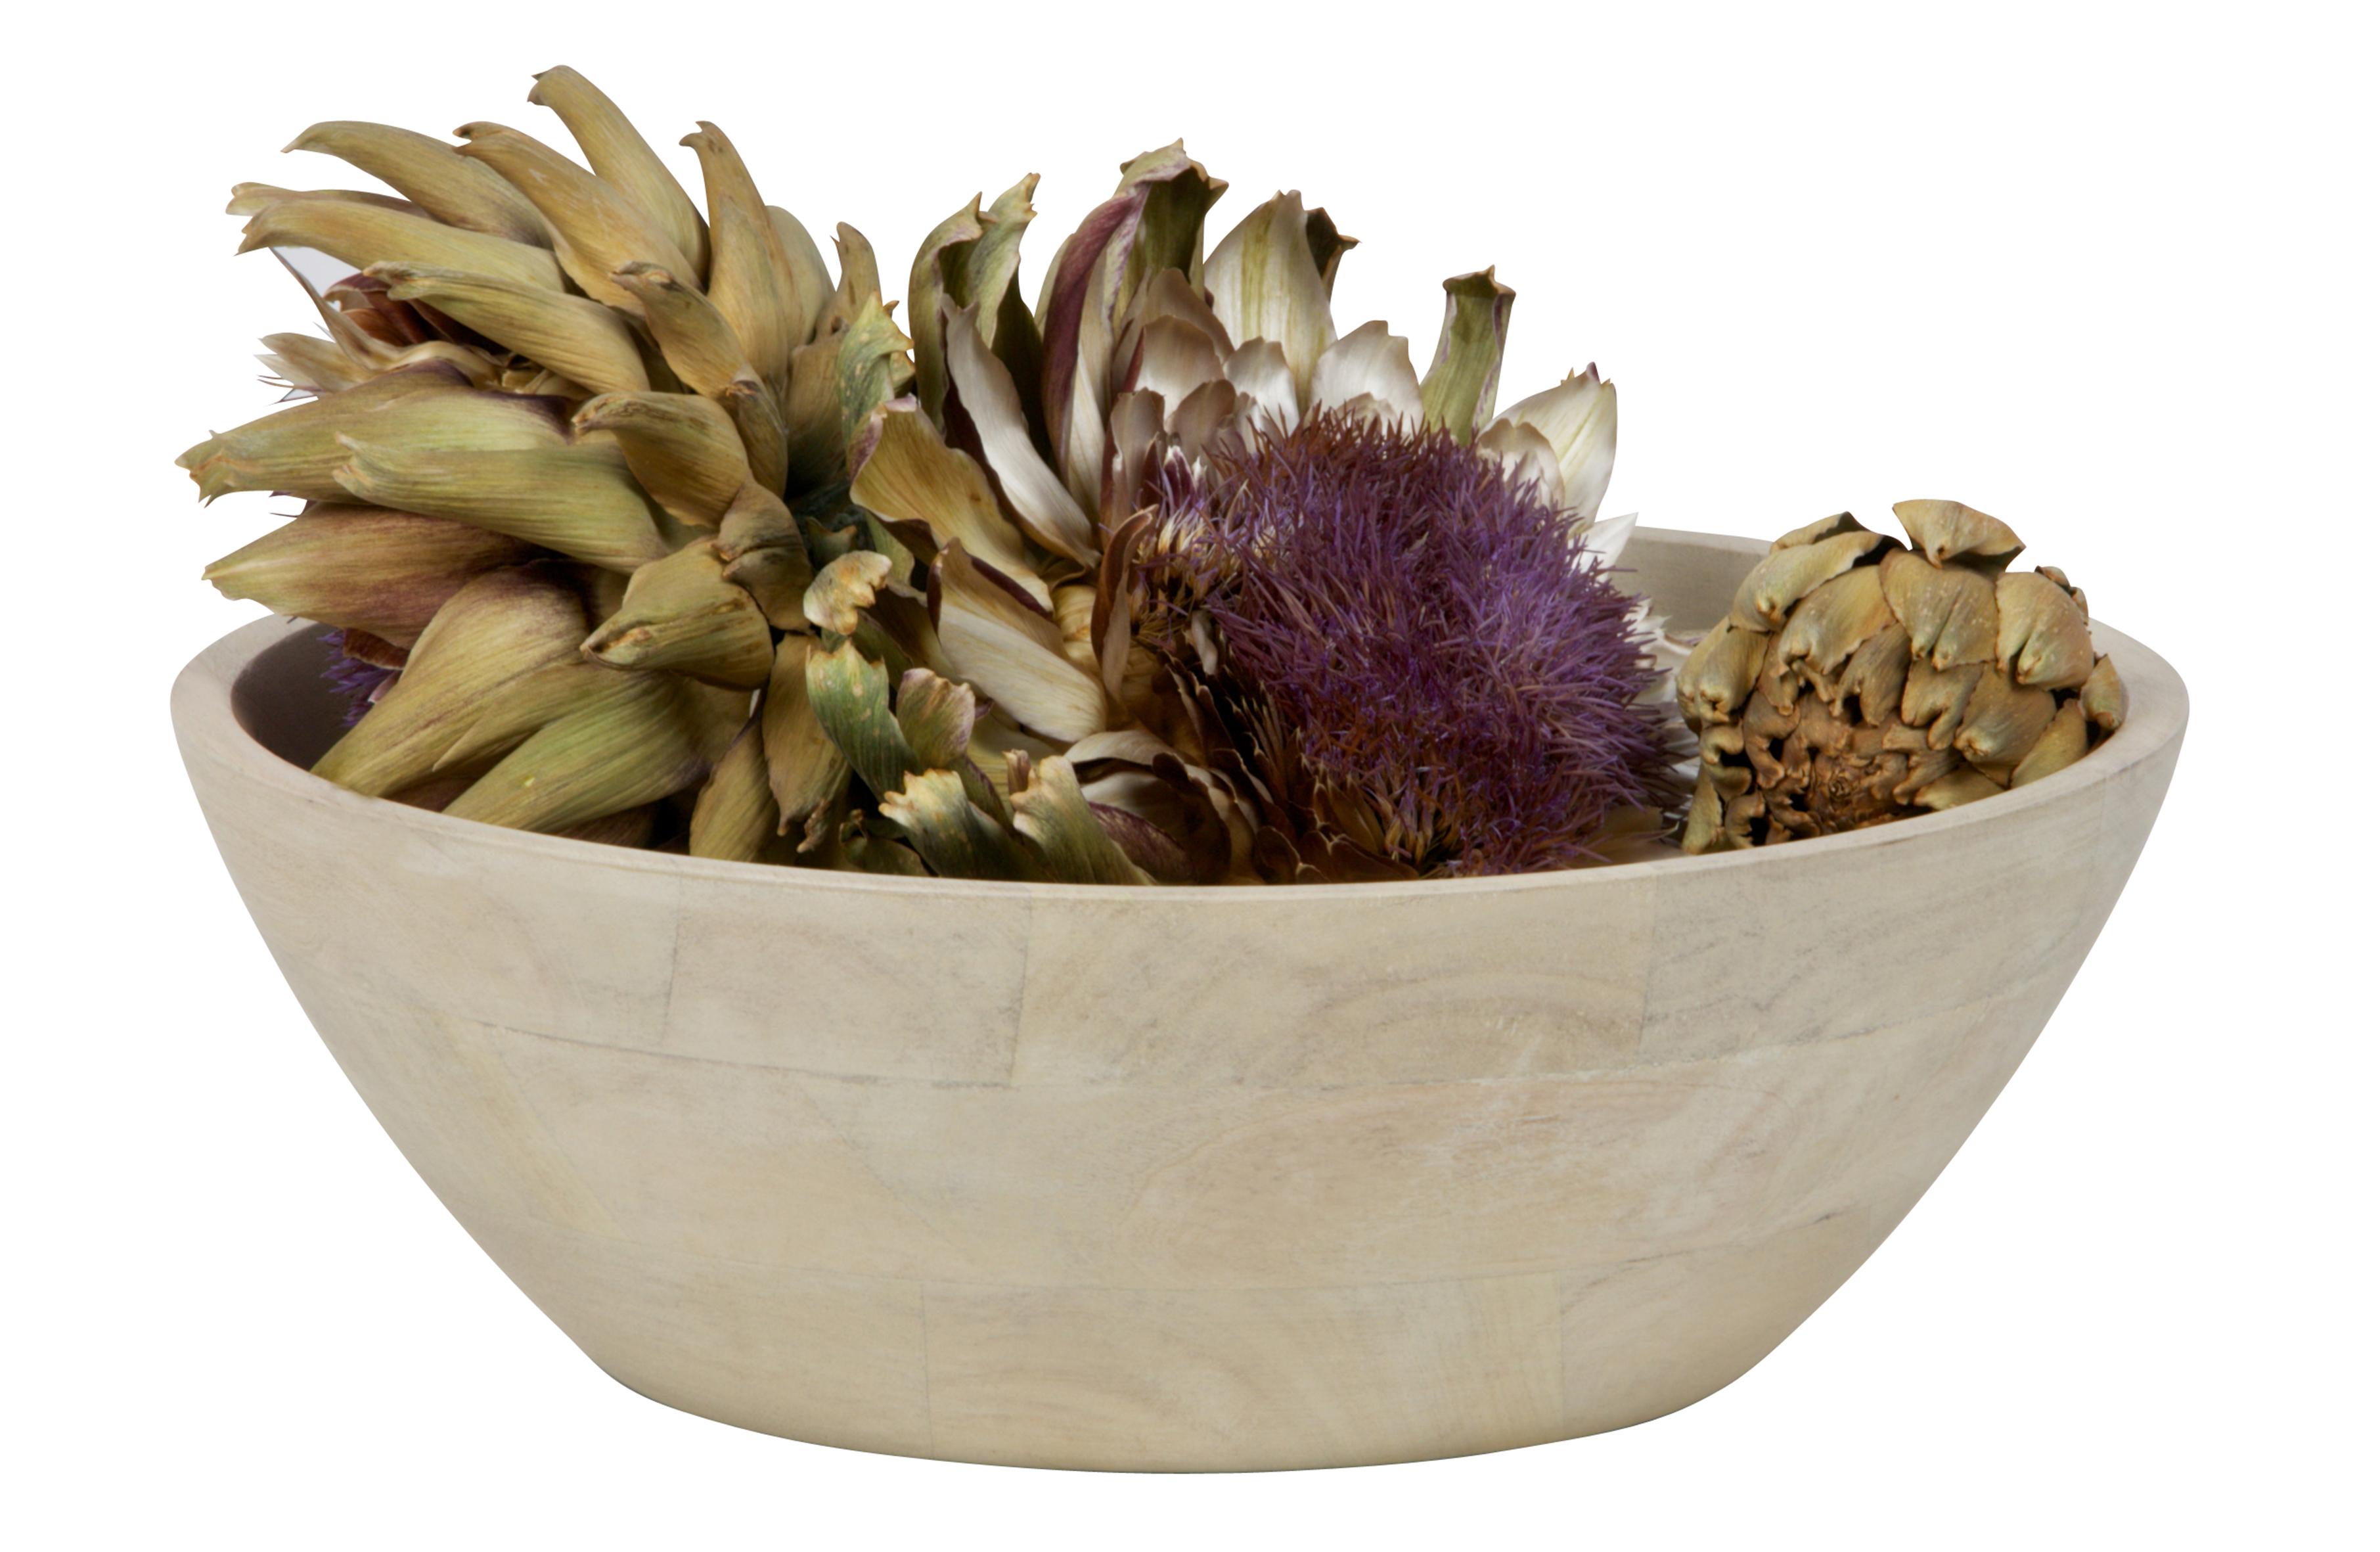 drum bowle l holz white wash accessoires wohnzimmer. Black Bedroom Furniture Sets. Home Design Ideas